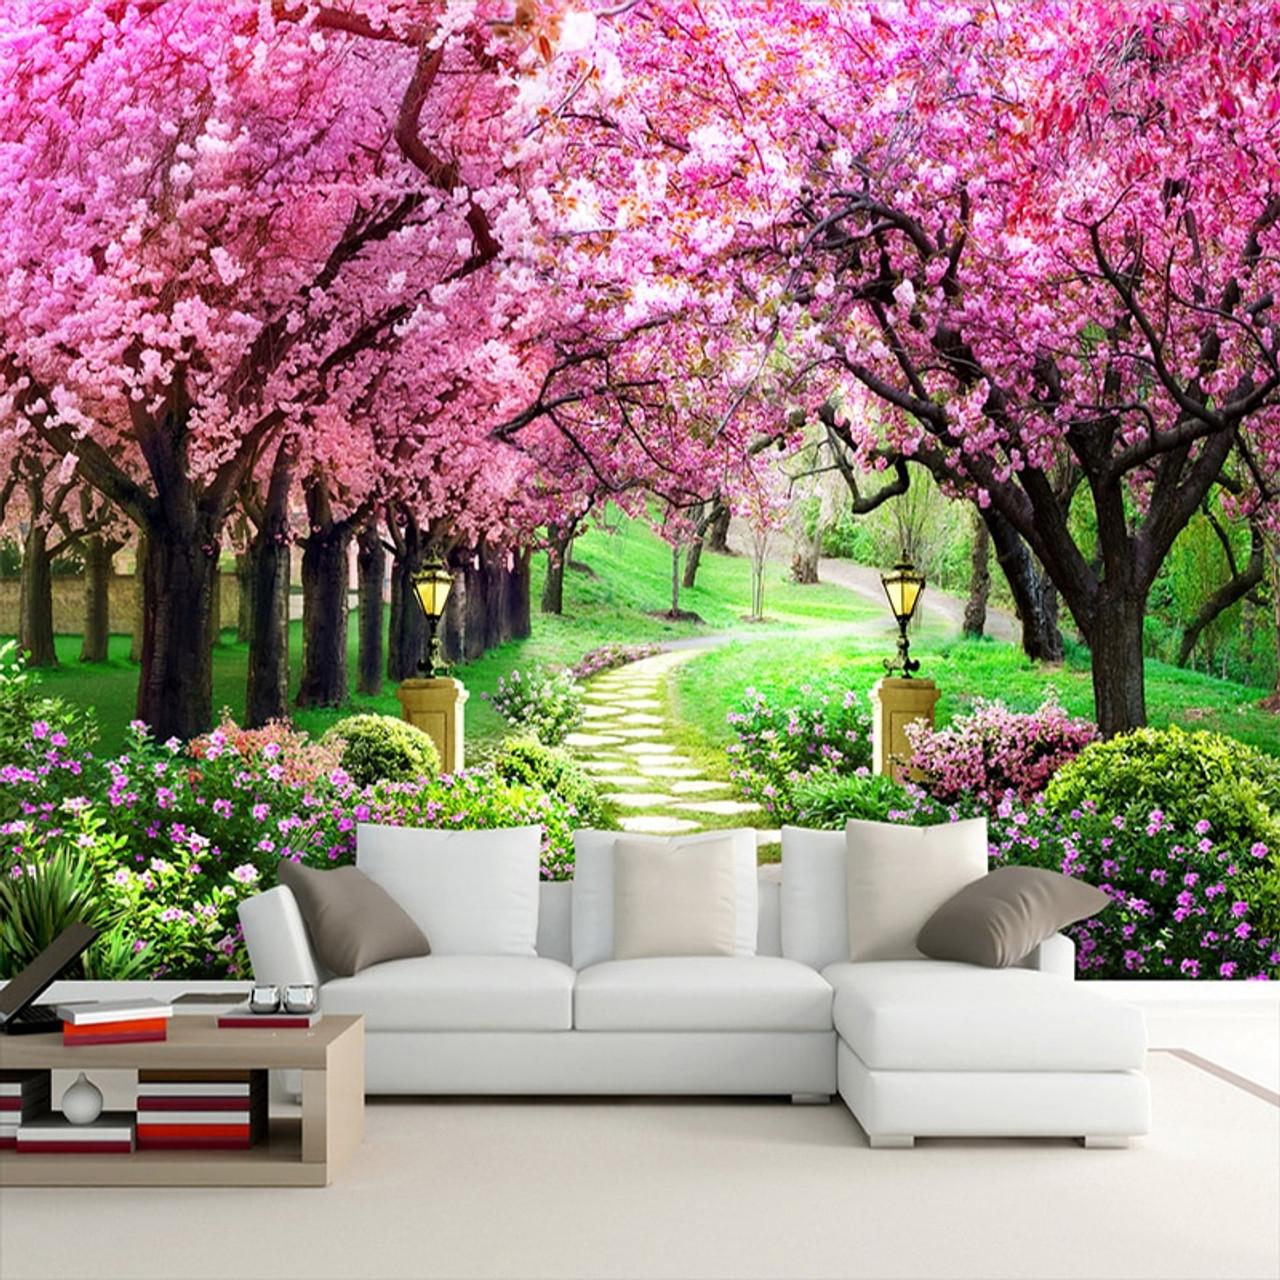 Custom 3d Photo Wallpaper Flower Romantic Cherry Blossom Tree Small